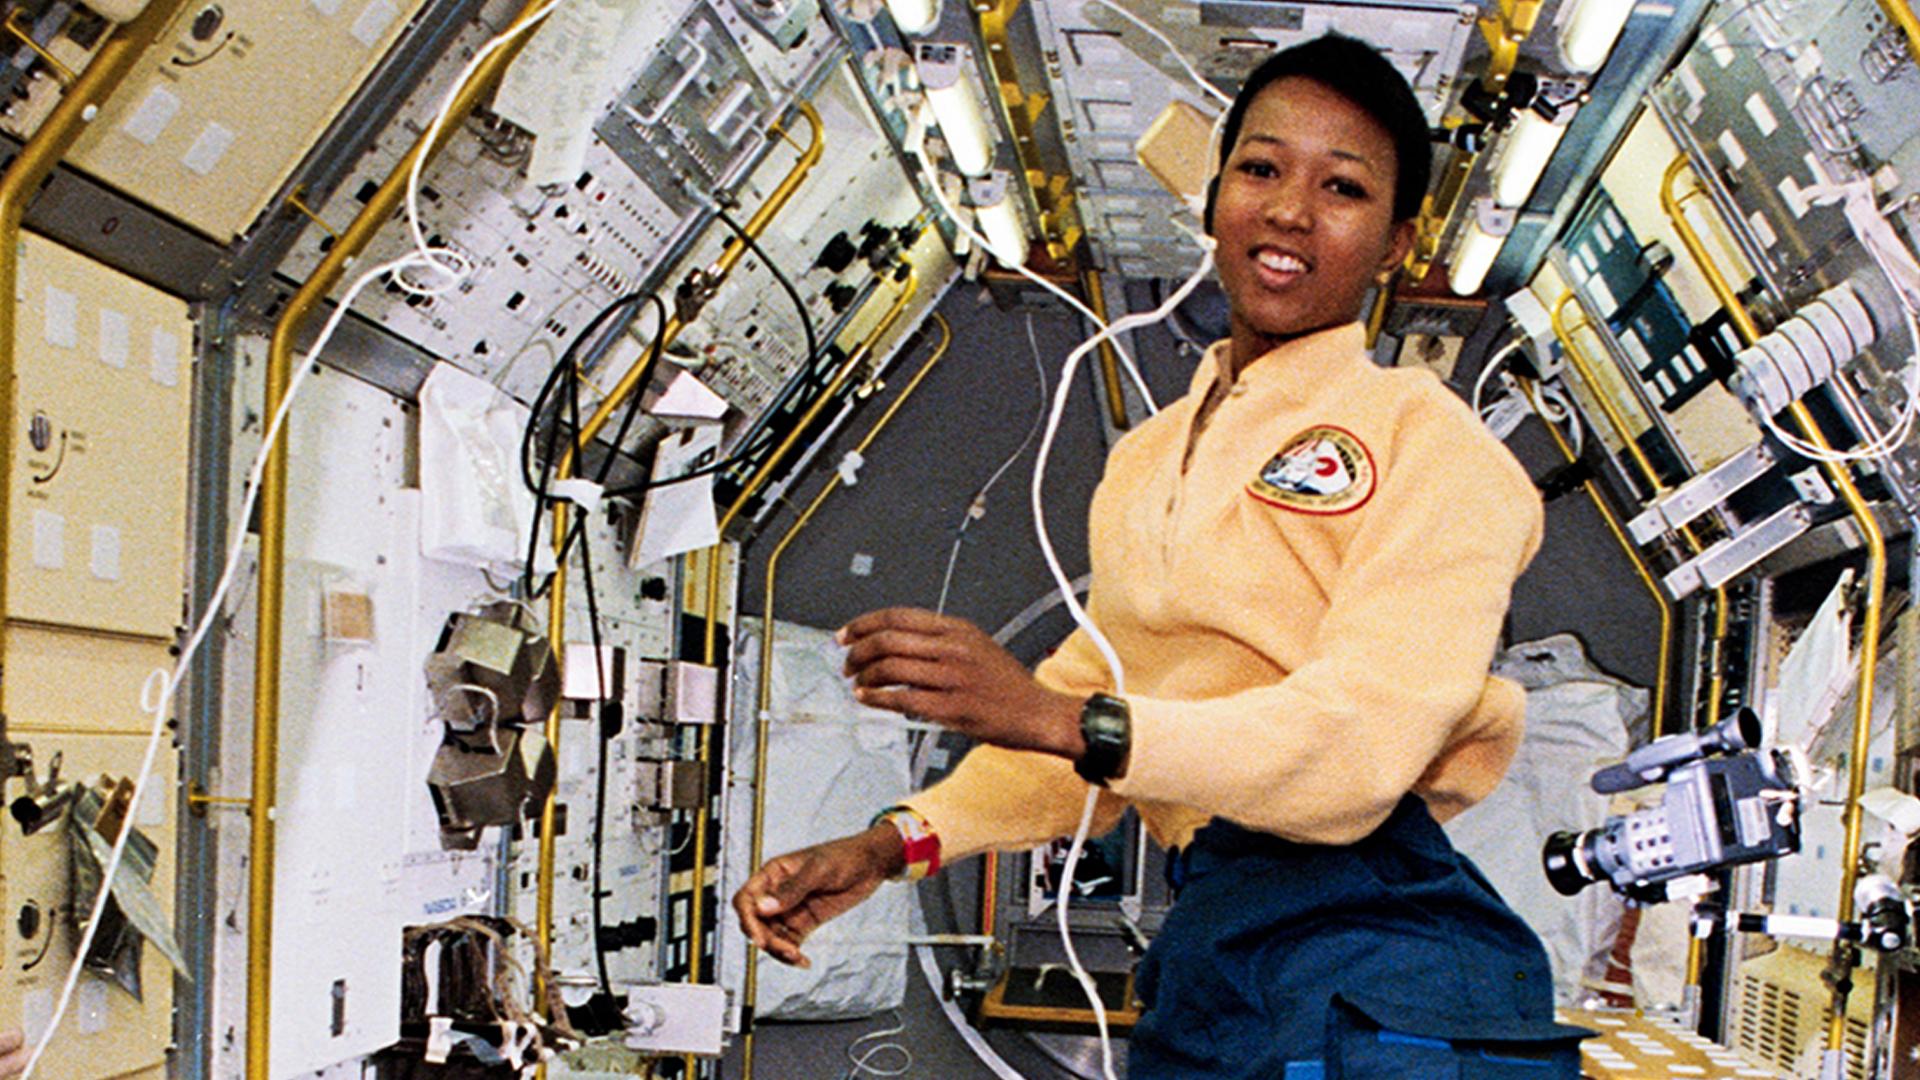 Astronaut Mae Jemison, Mae Jemison, KINDR'D Magazine, KINDR'D, KOLUMN Magazine, KOLUMN, Willoughby Avenue